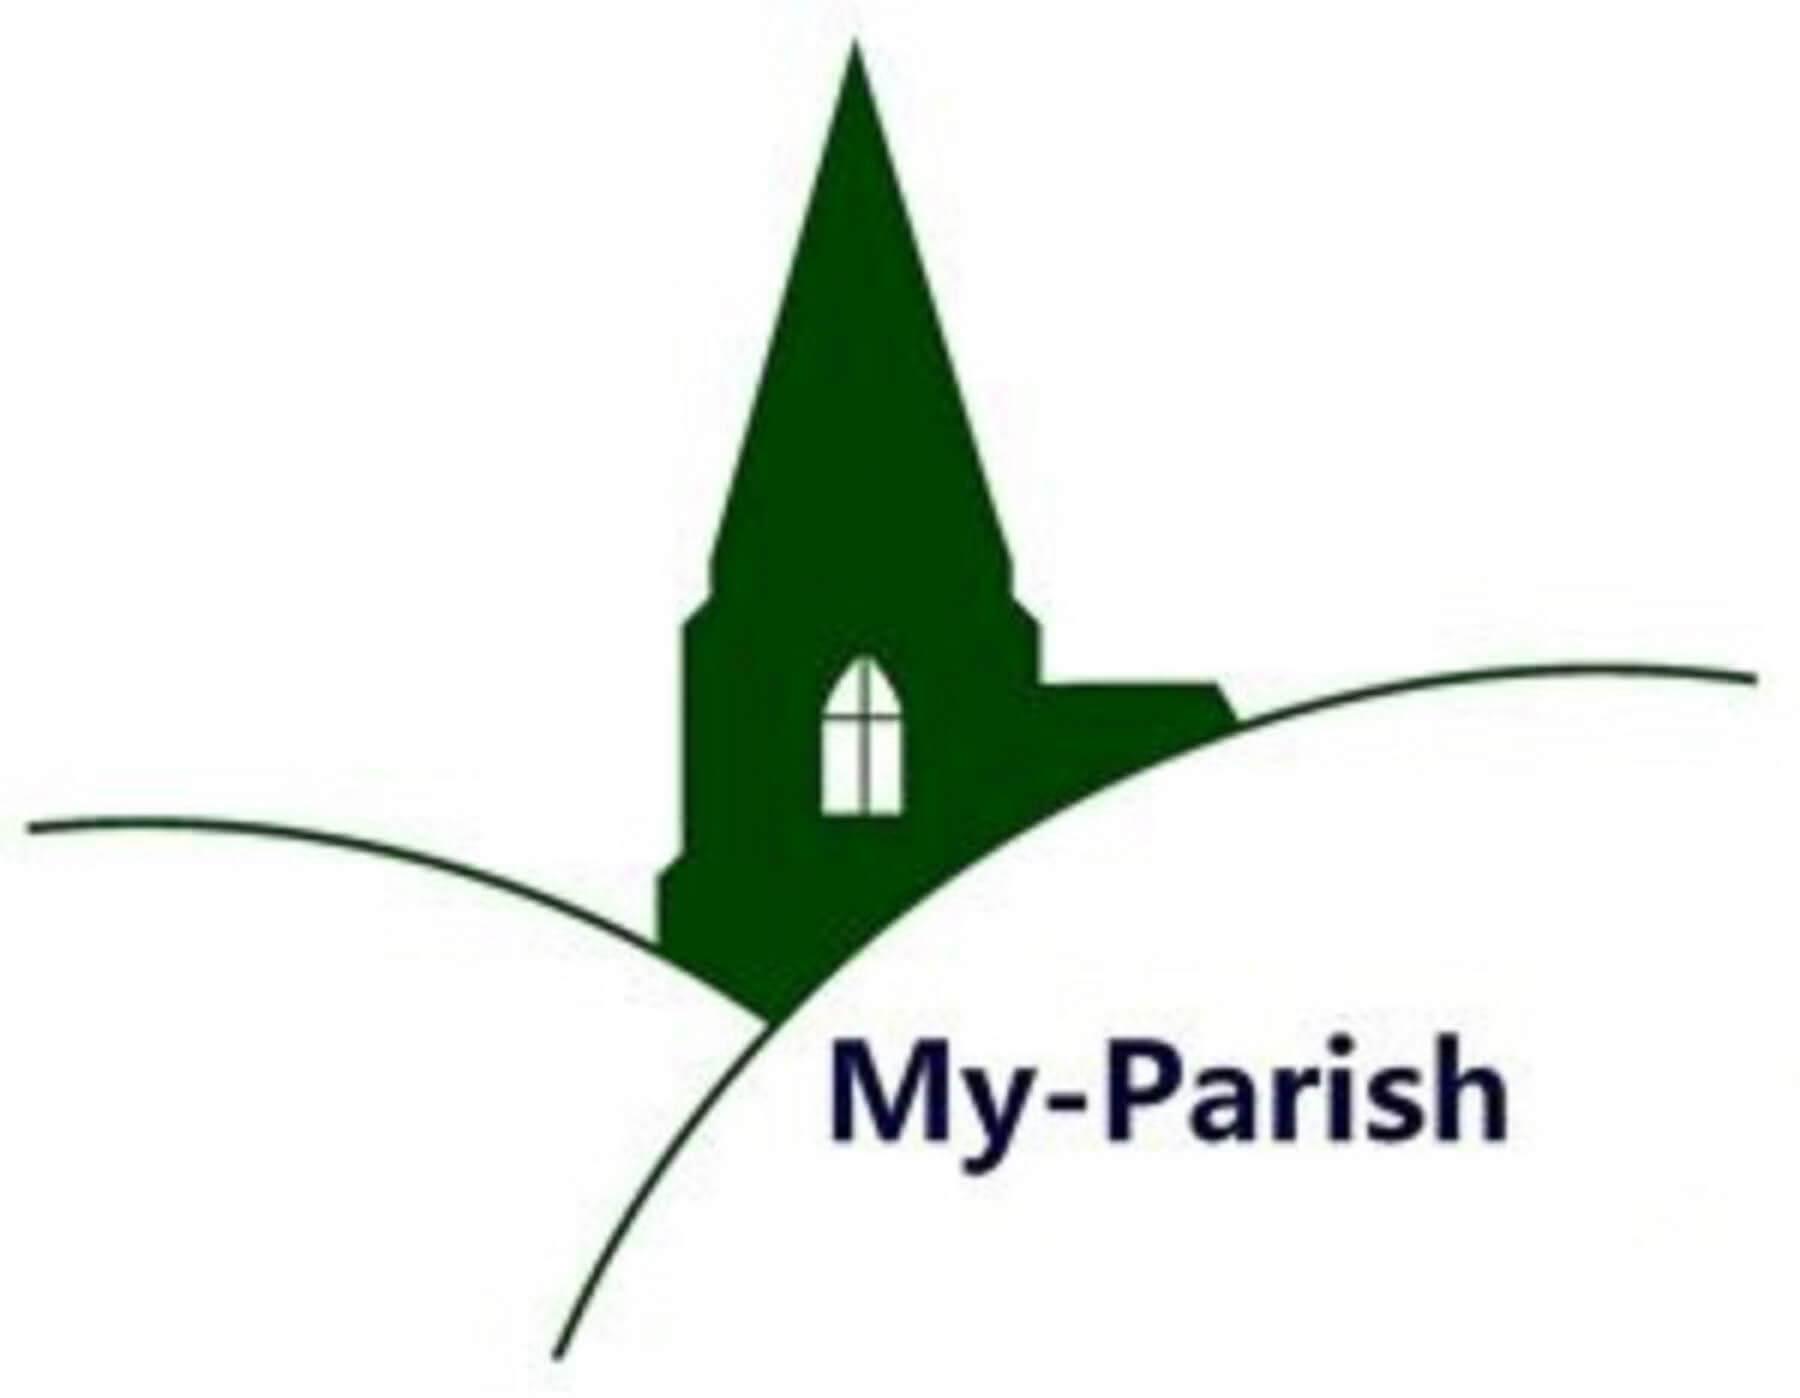 The Digital Parish - Fifteenth Warwick Symposium on Parish Research